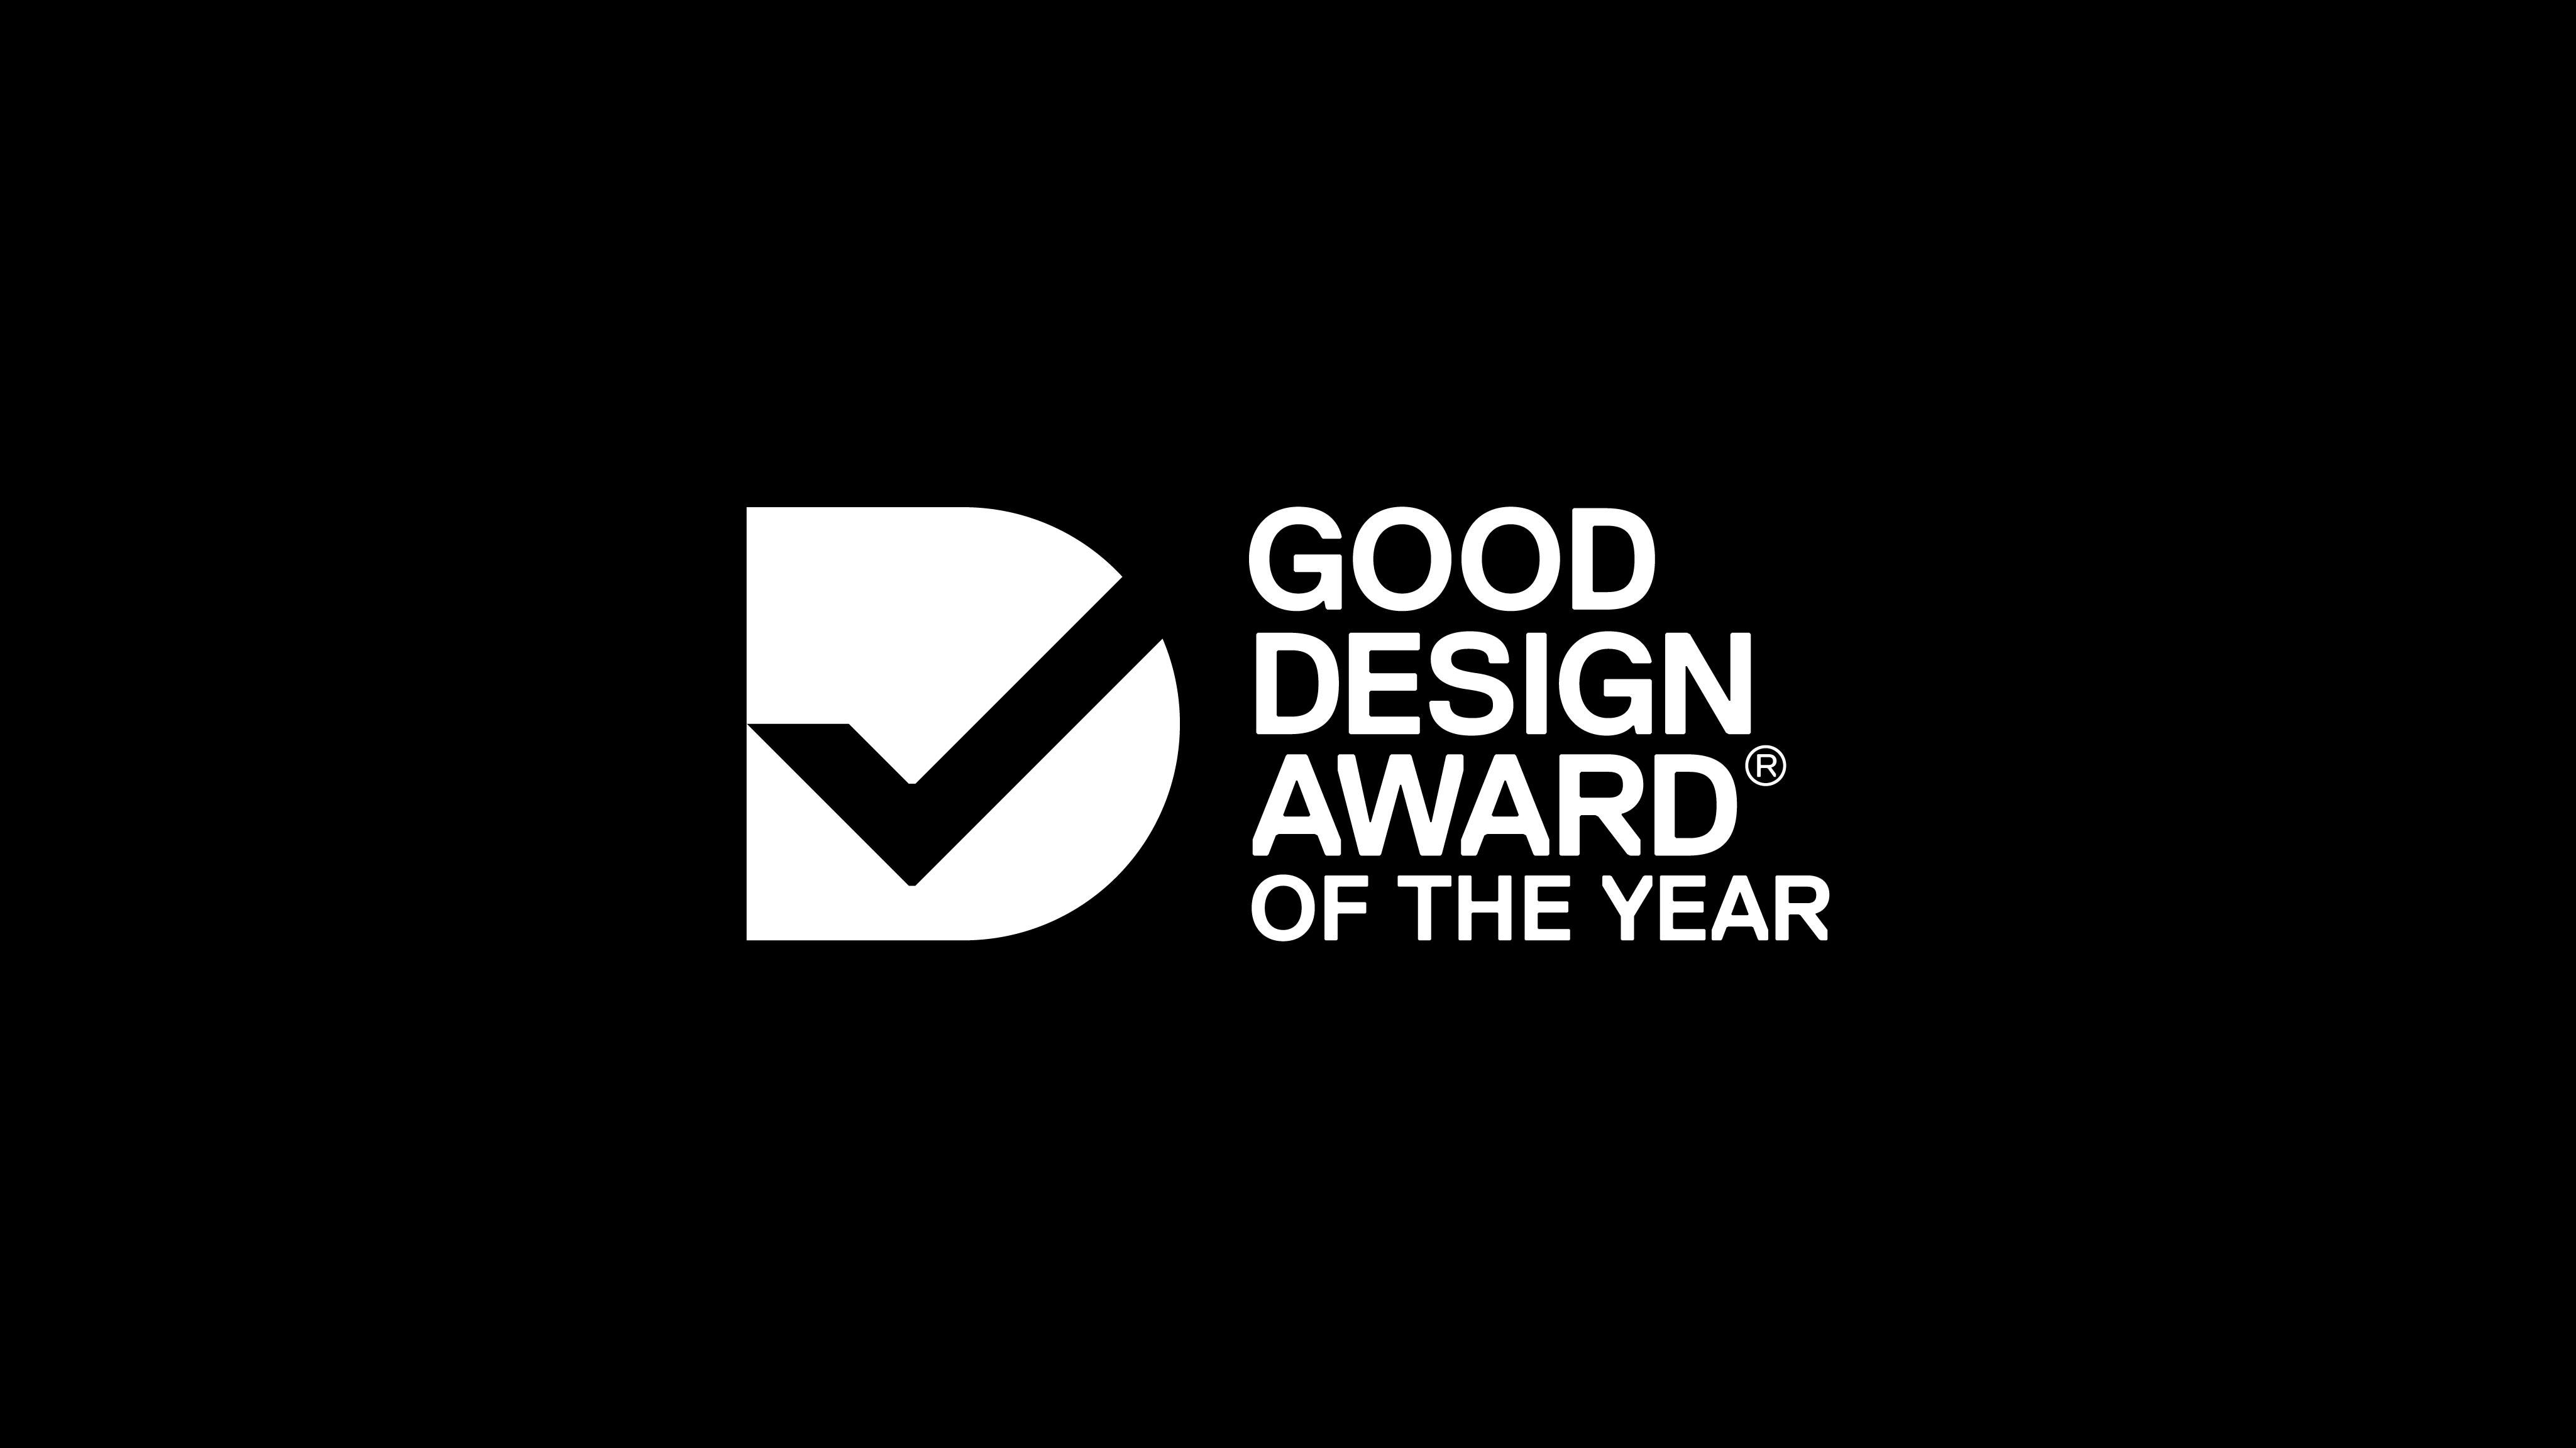 Good Design Award of the Year